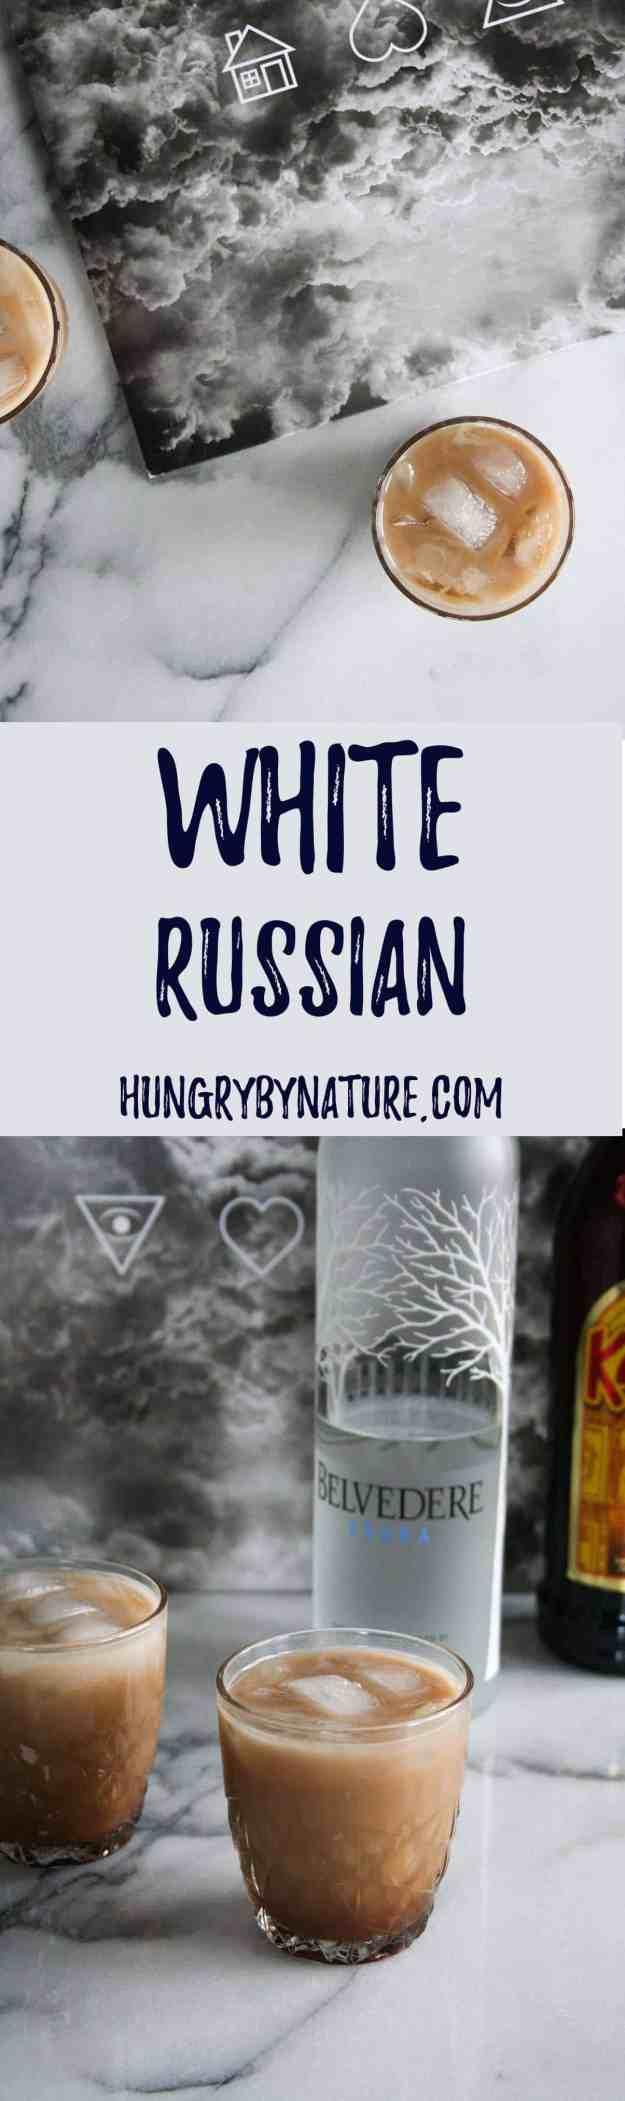 White Russian | drink, recipe, cocktail, skinny, light, dessert | hungrybynature.com